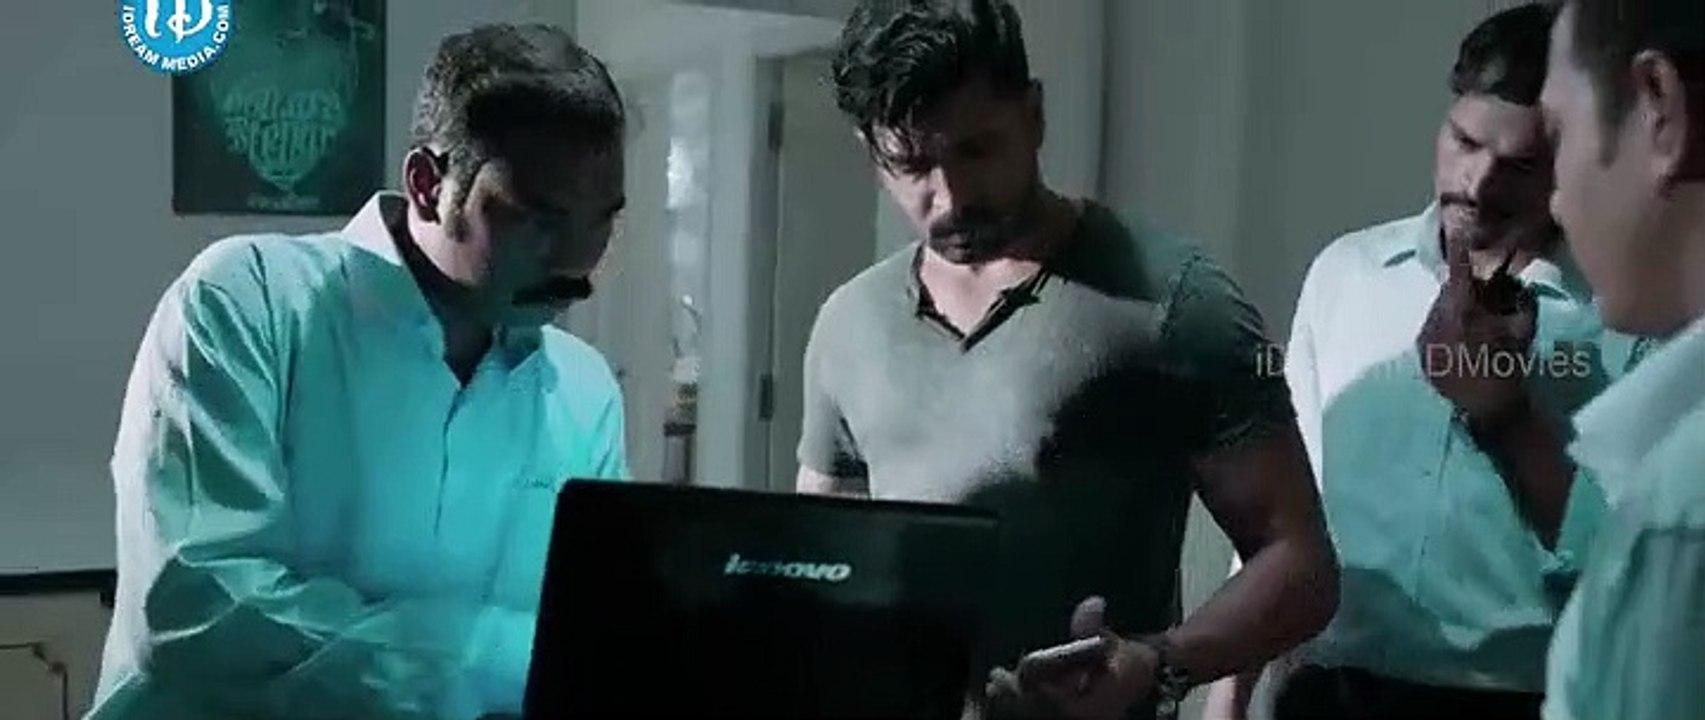 Crime 23 2018 Telugu Part 3 Video Dailymotion